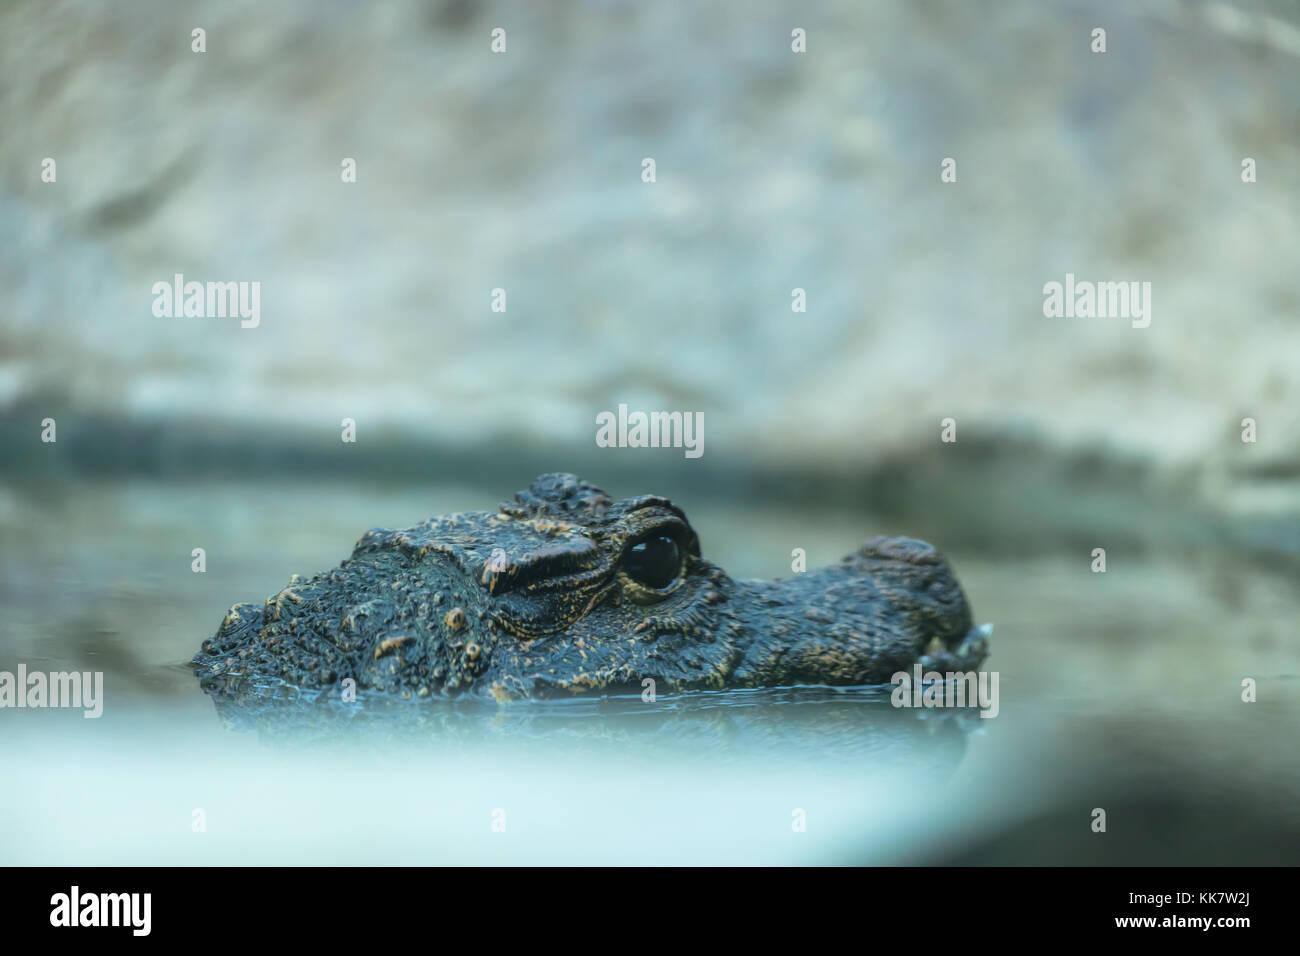 Head side view of an African dwarf crocodile, San Diego Zoo, California, USA. - Stock Image